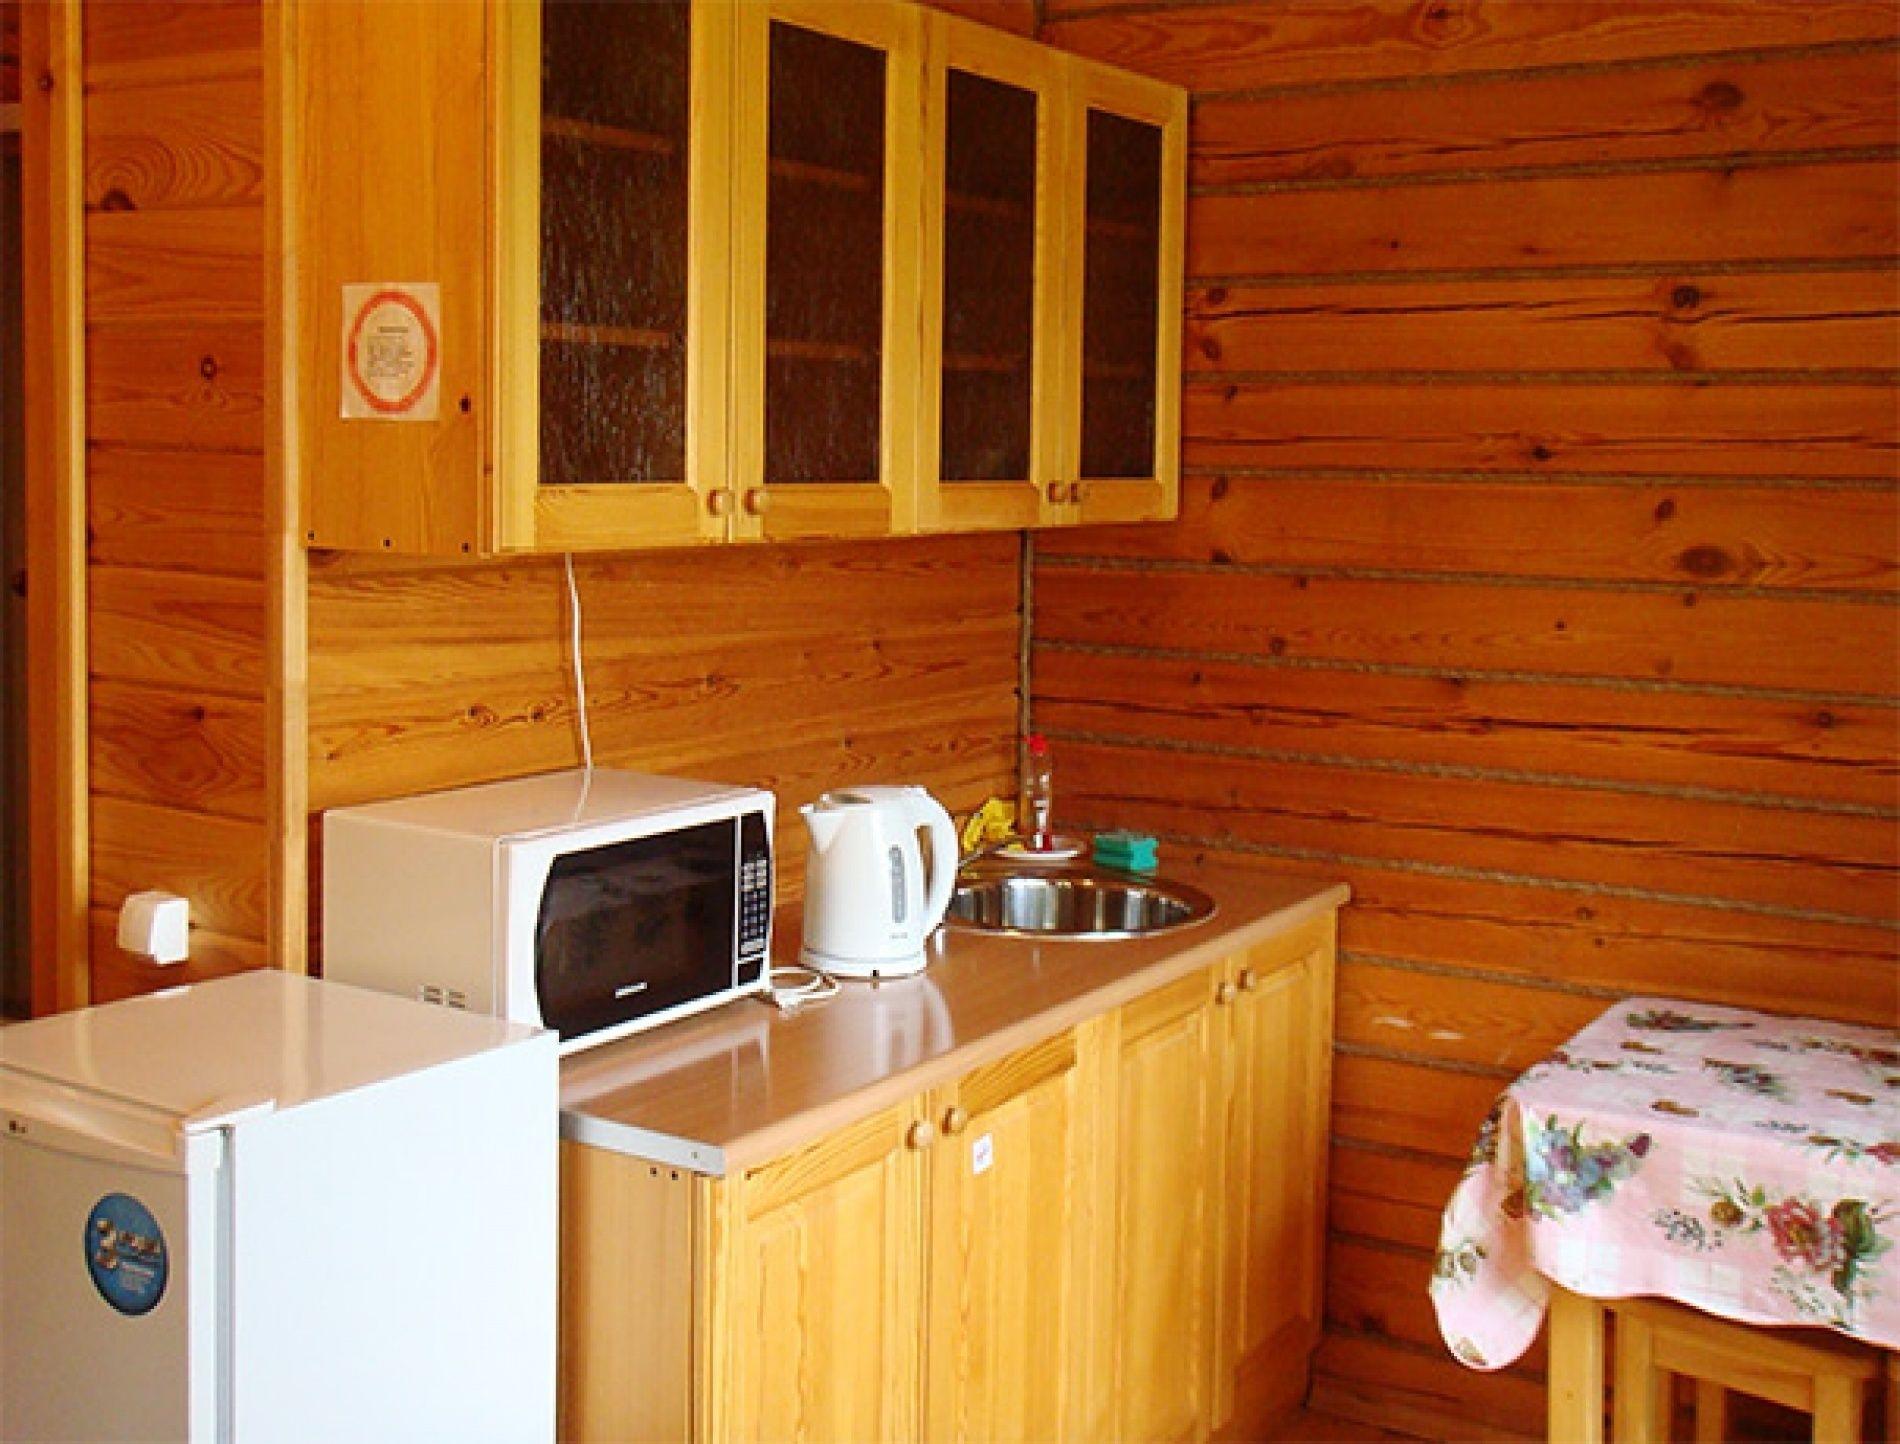 "База отдыха ""Рябинушка"" Удмуртская Республика 2-местная комната в коттедже, фото 4"